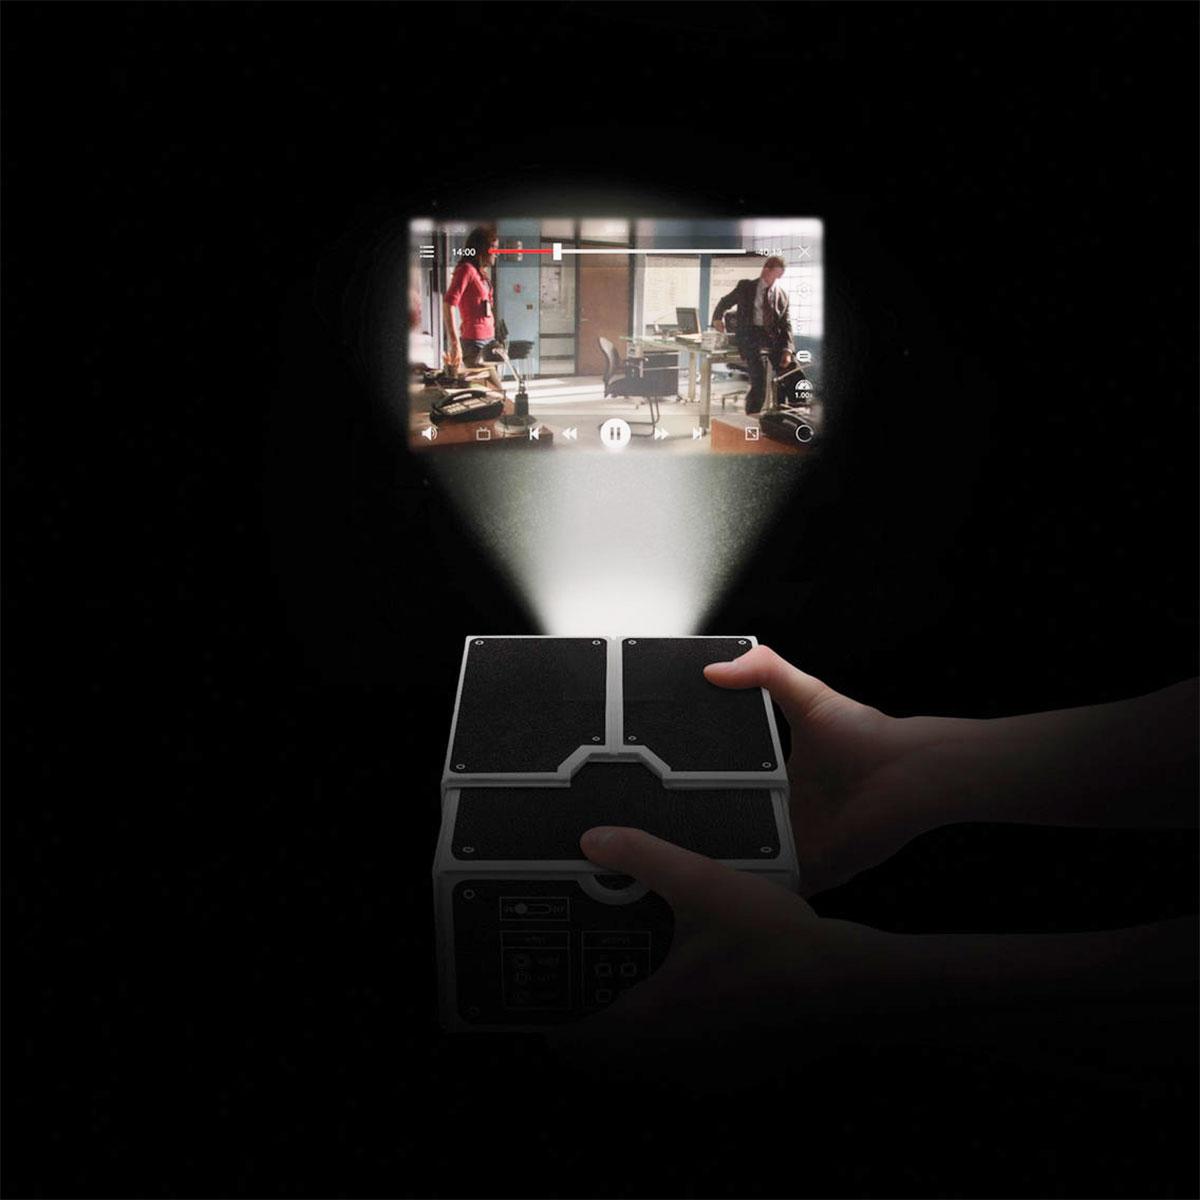 Proiettore Di Cartone Per Smartphone